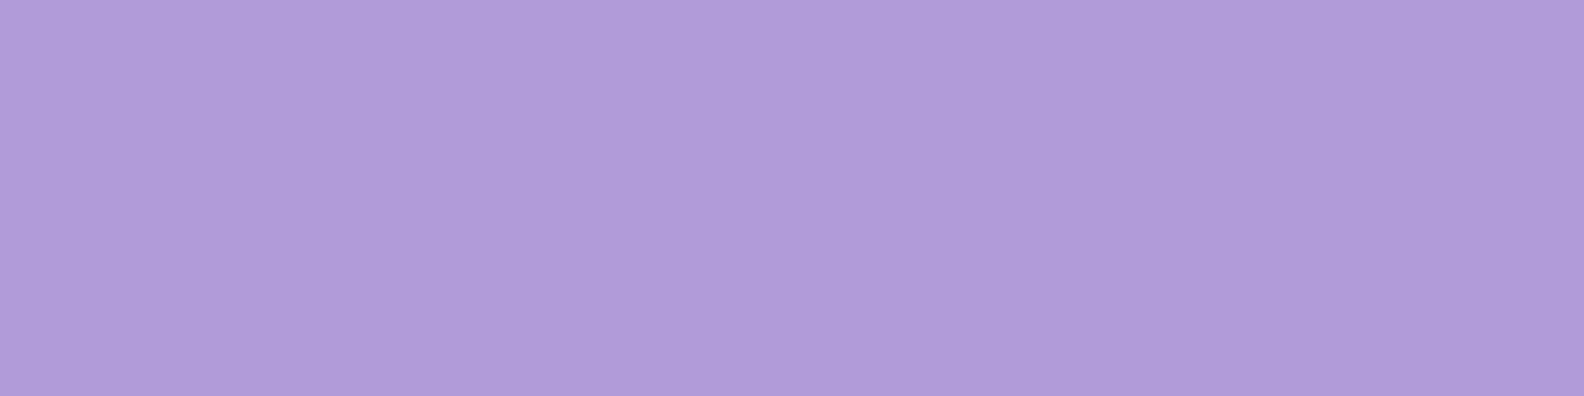 1584x396 Light Pastel Purple Solid Color Background